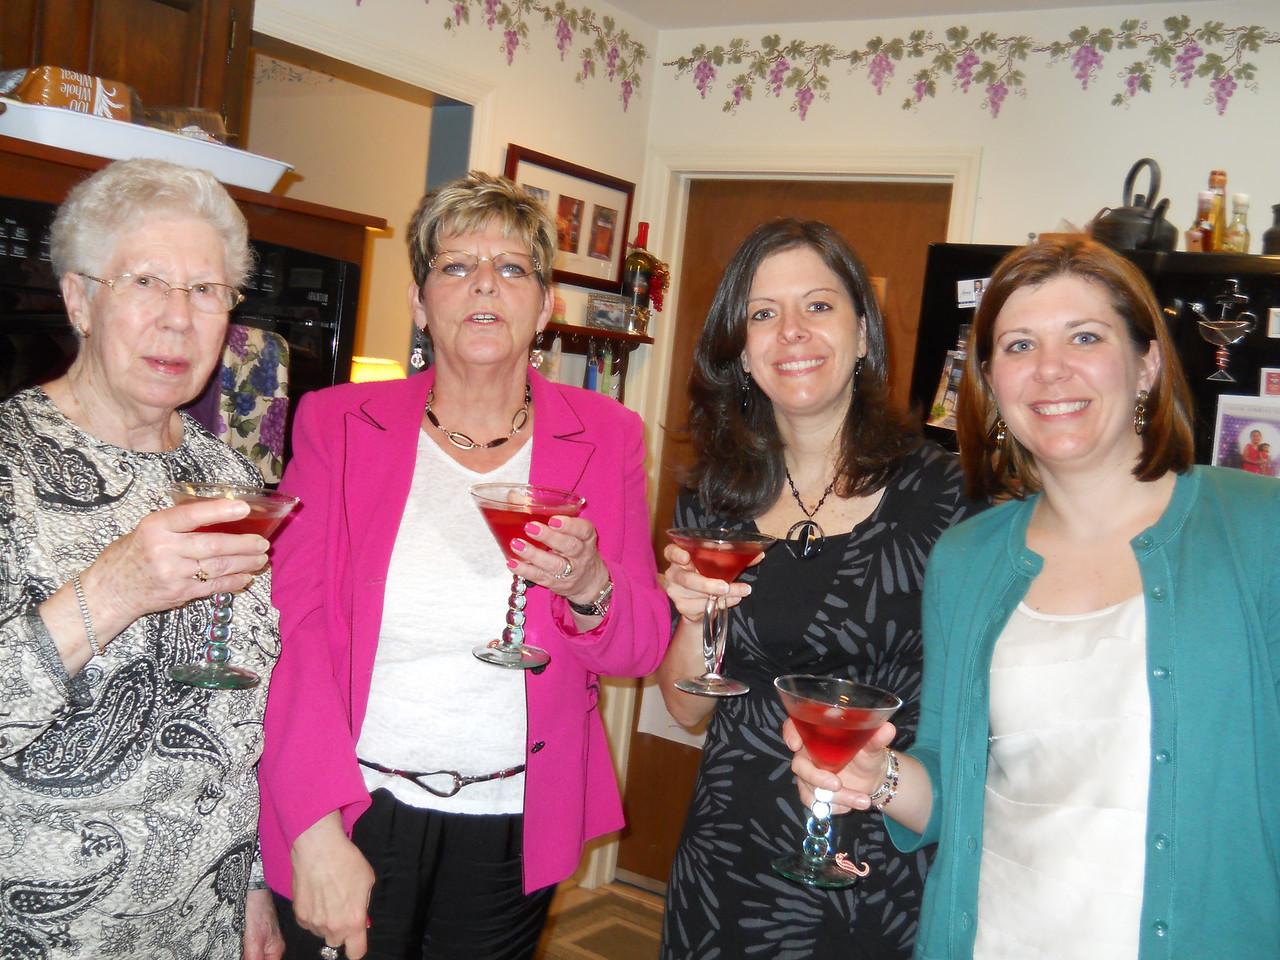 Nana, Becky, Cara and Ilsa toasting Easter